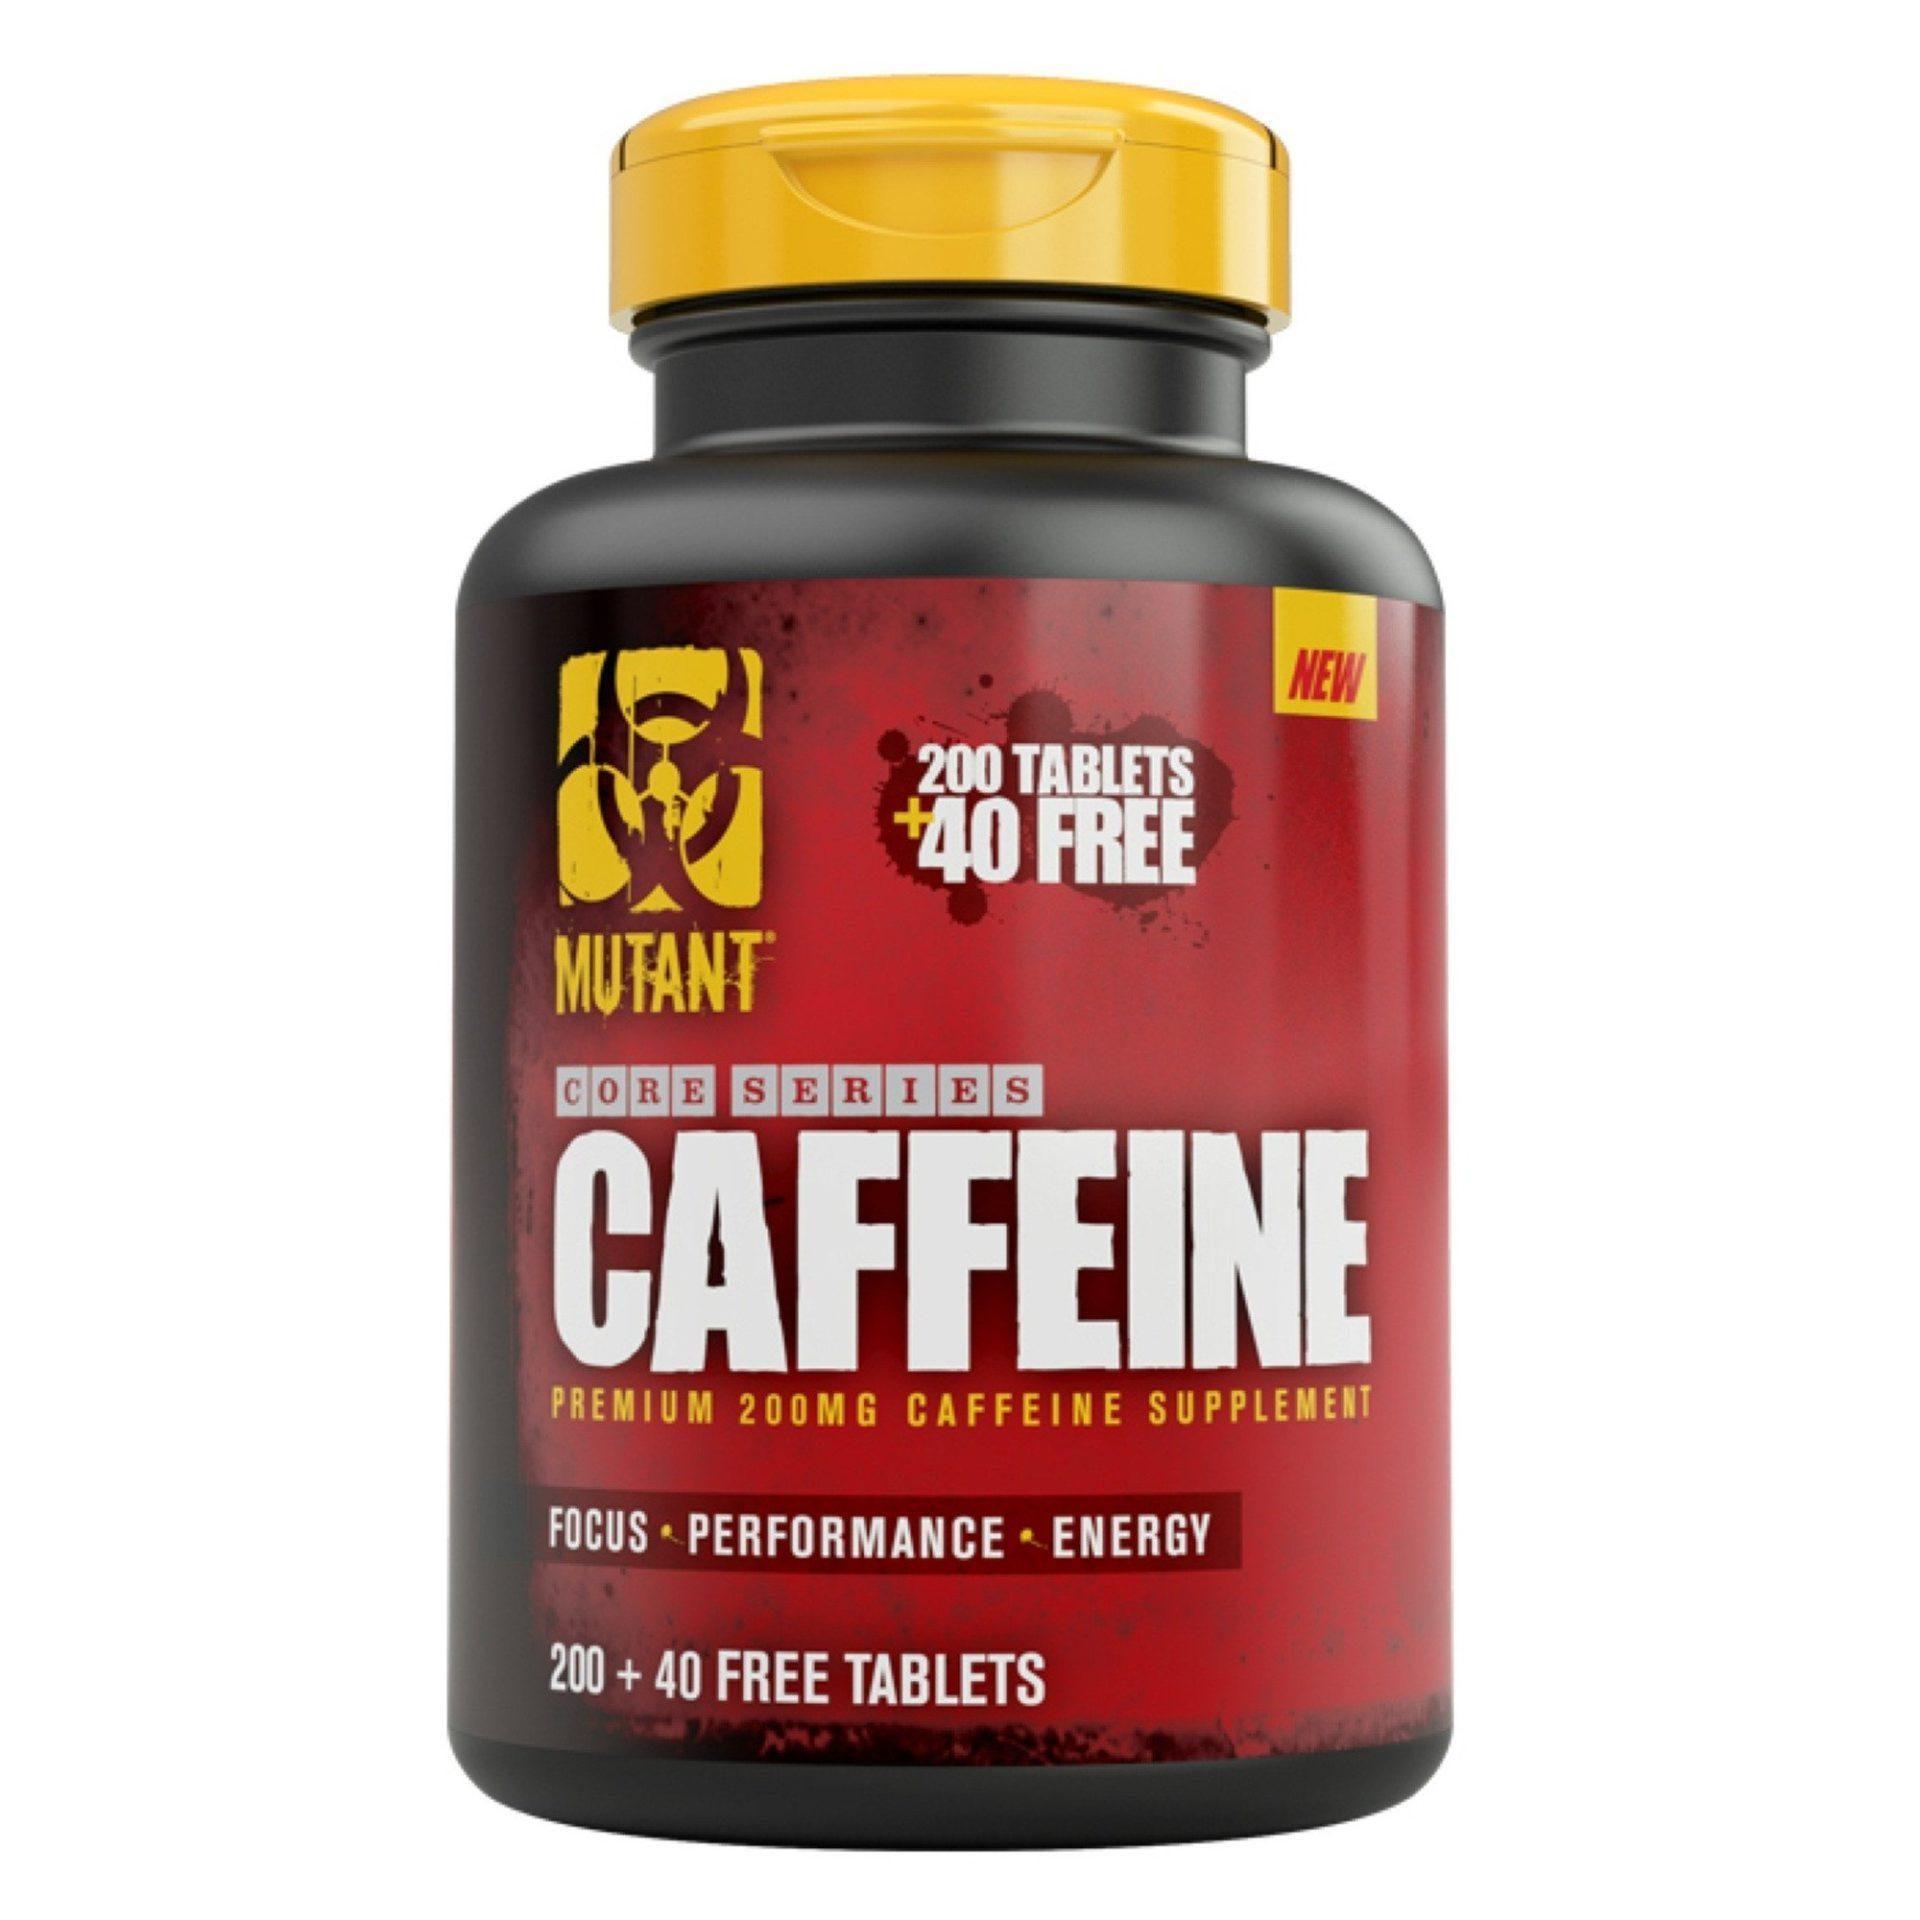 Mutant Core Caffeine 240 tabs